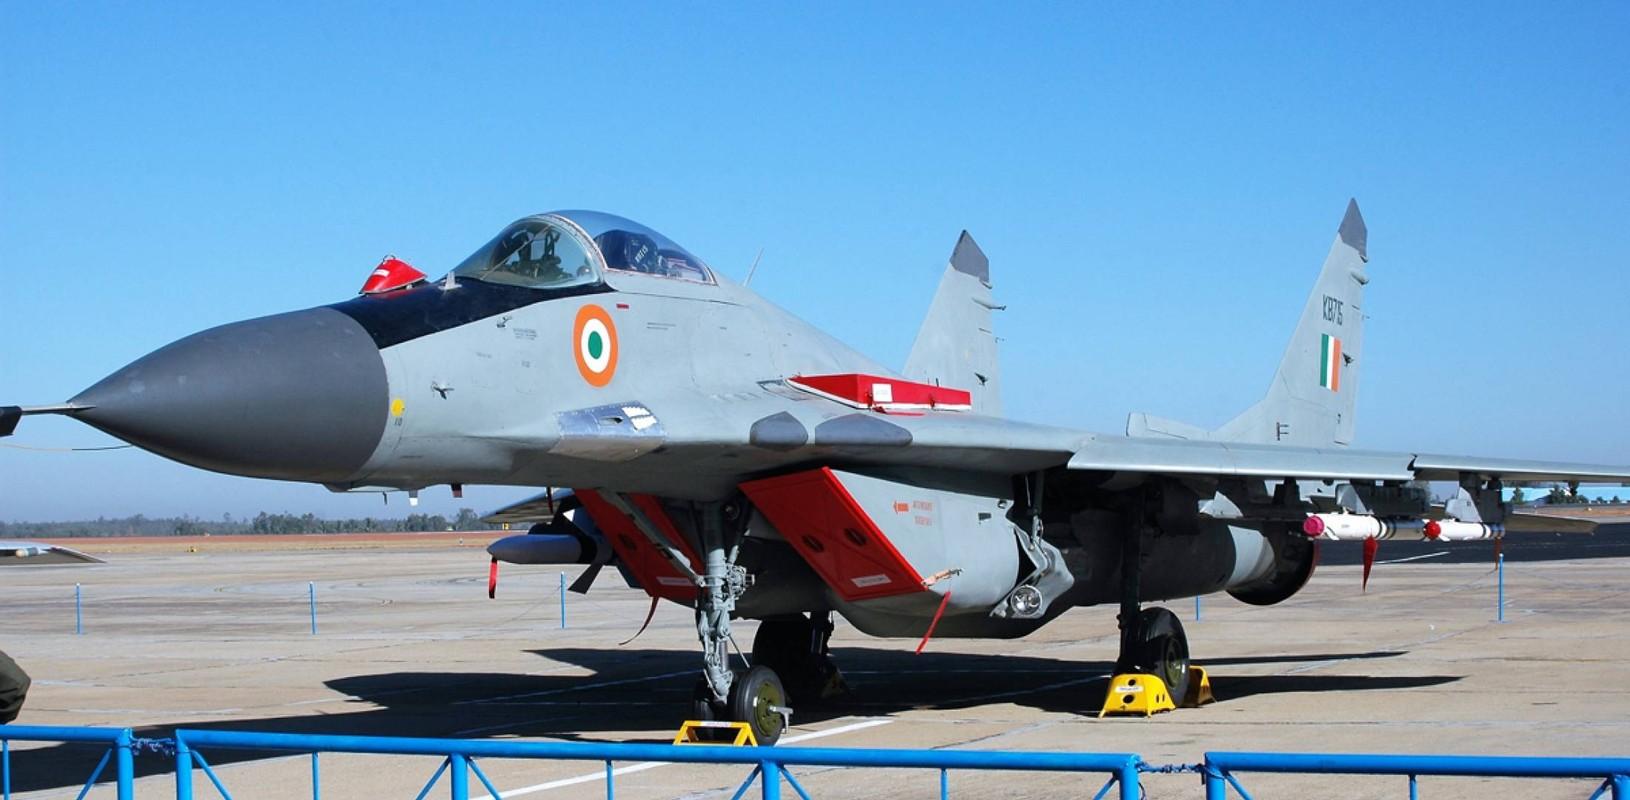 MiG-29 moi la loai may bay duoc xuat khau nhieu nhat cua Nga-Hinh-13